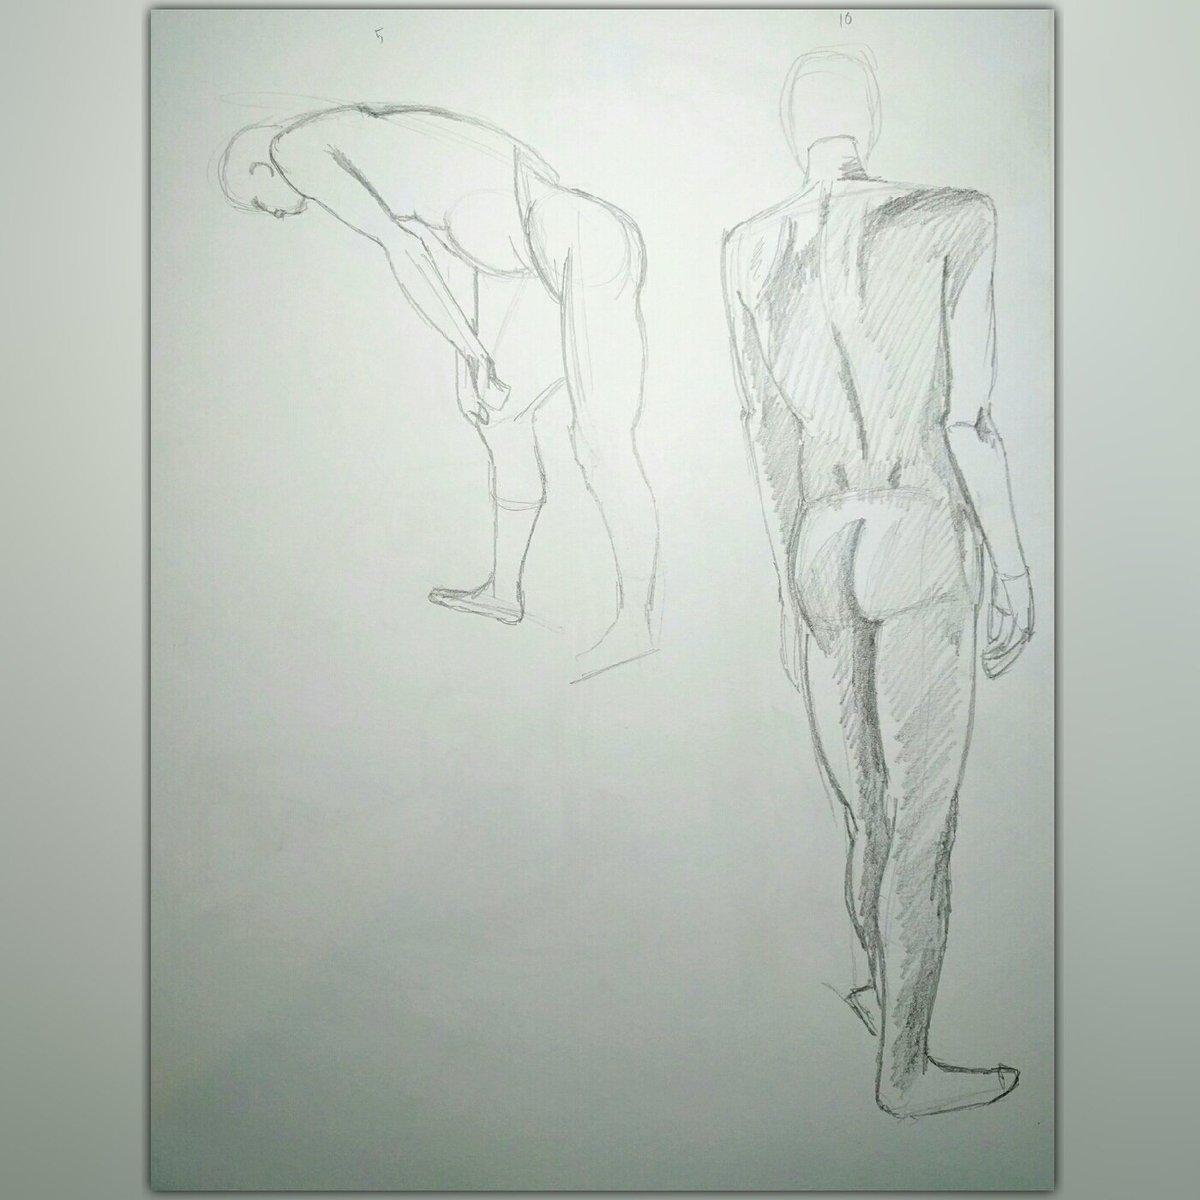 Hoodlum Design On Twitter Naked People More Life Drawing Anatomy